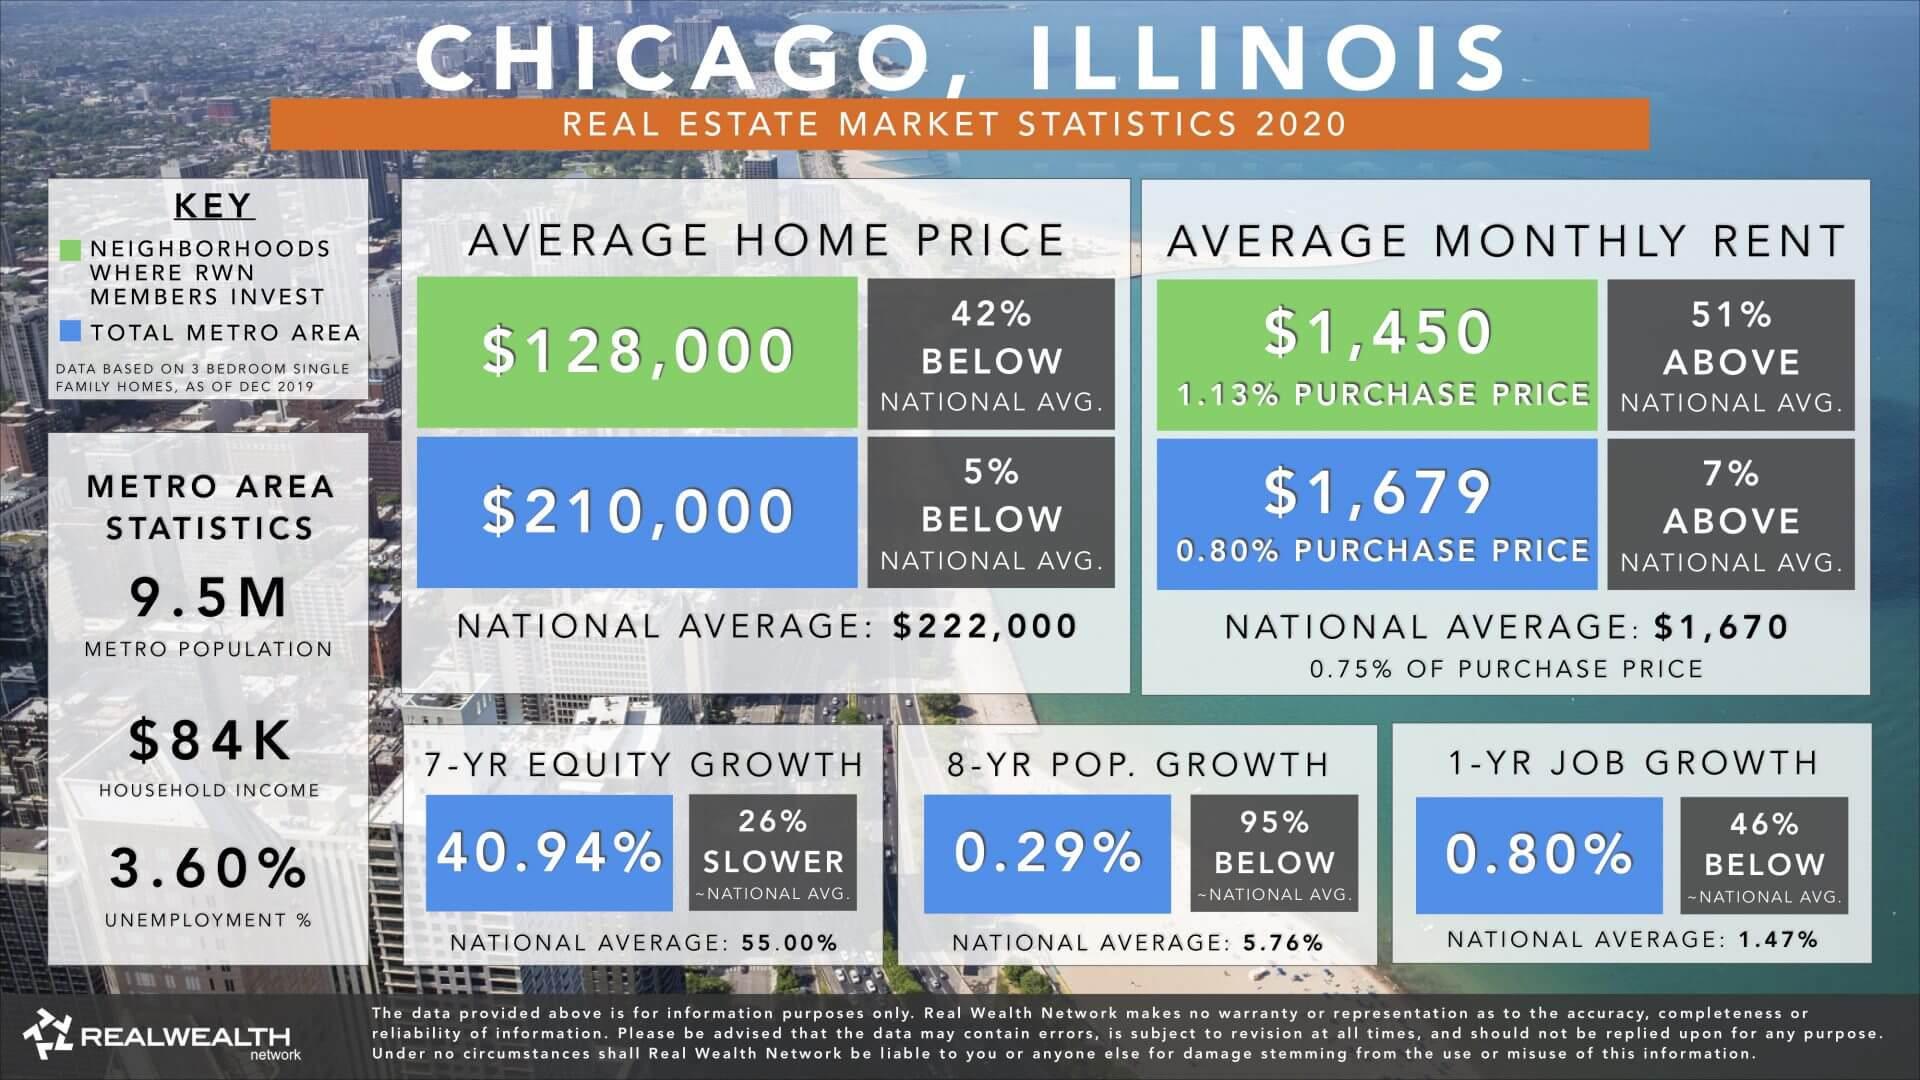 Chicago Real Estate Market Trends & Statistics 2020